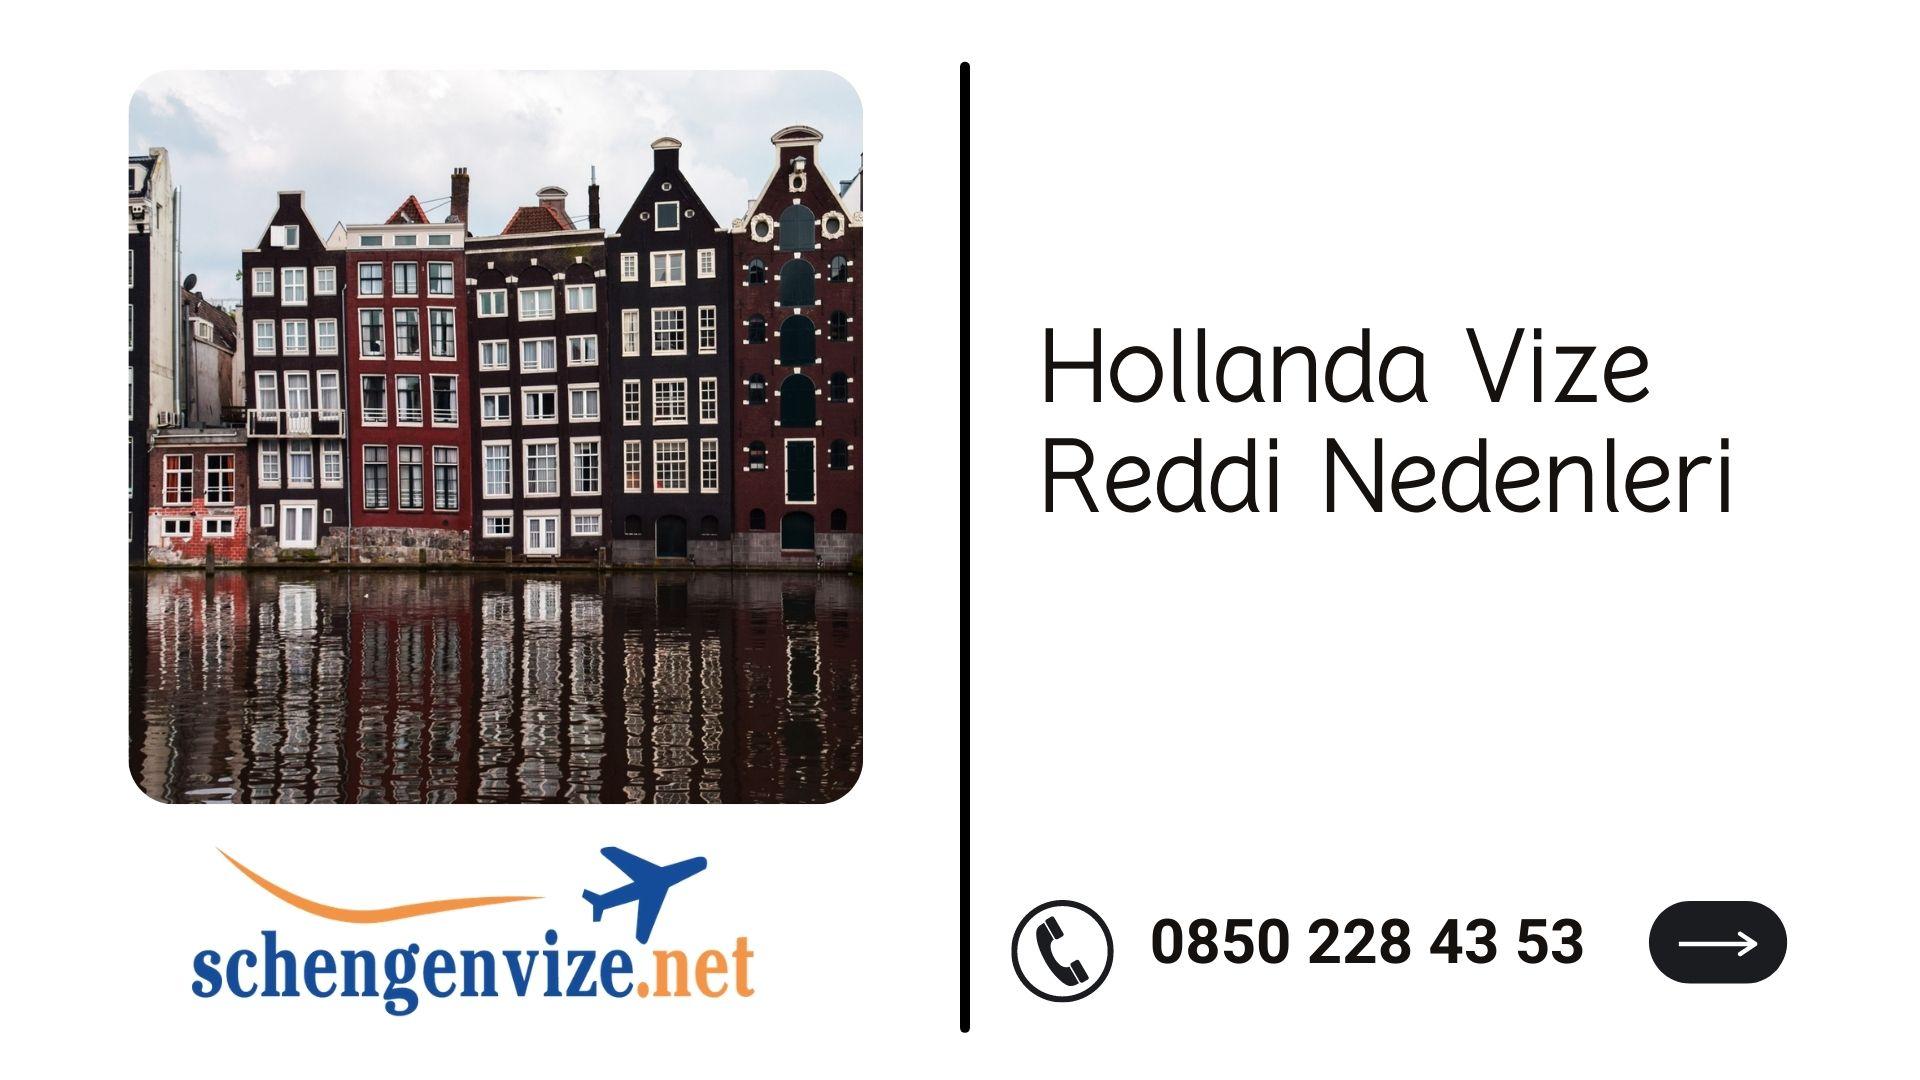 Hollanda Vize Reddi Nedenleri